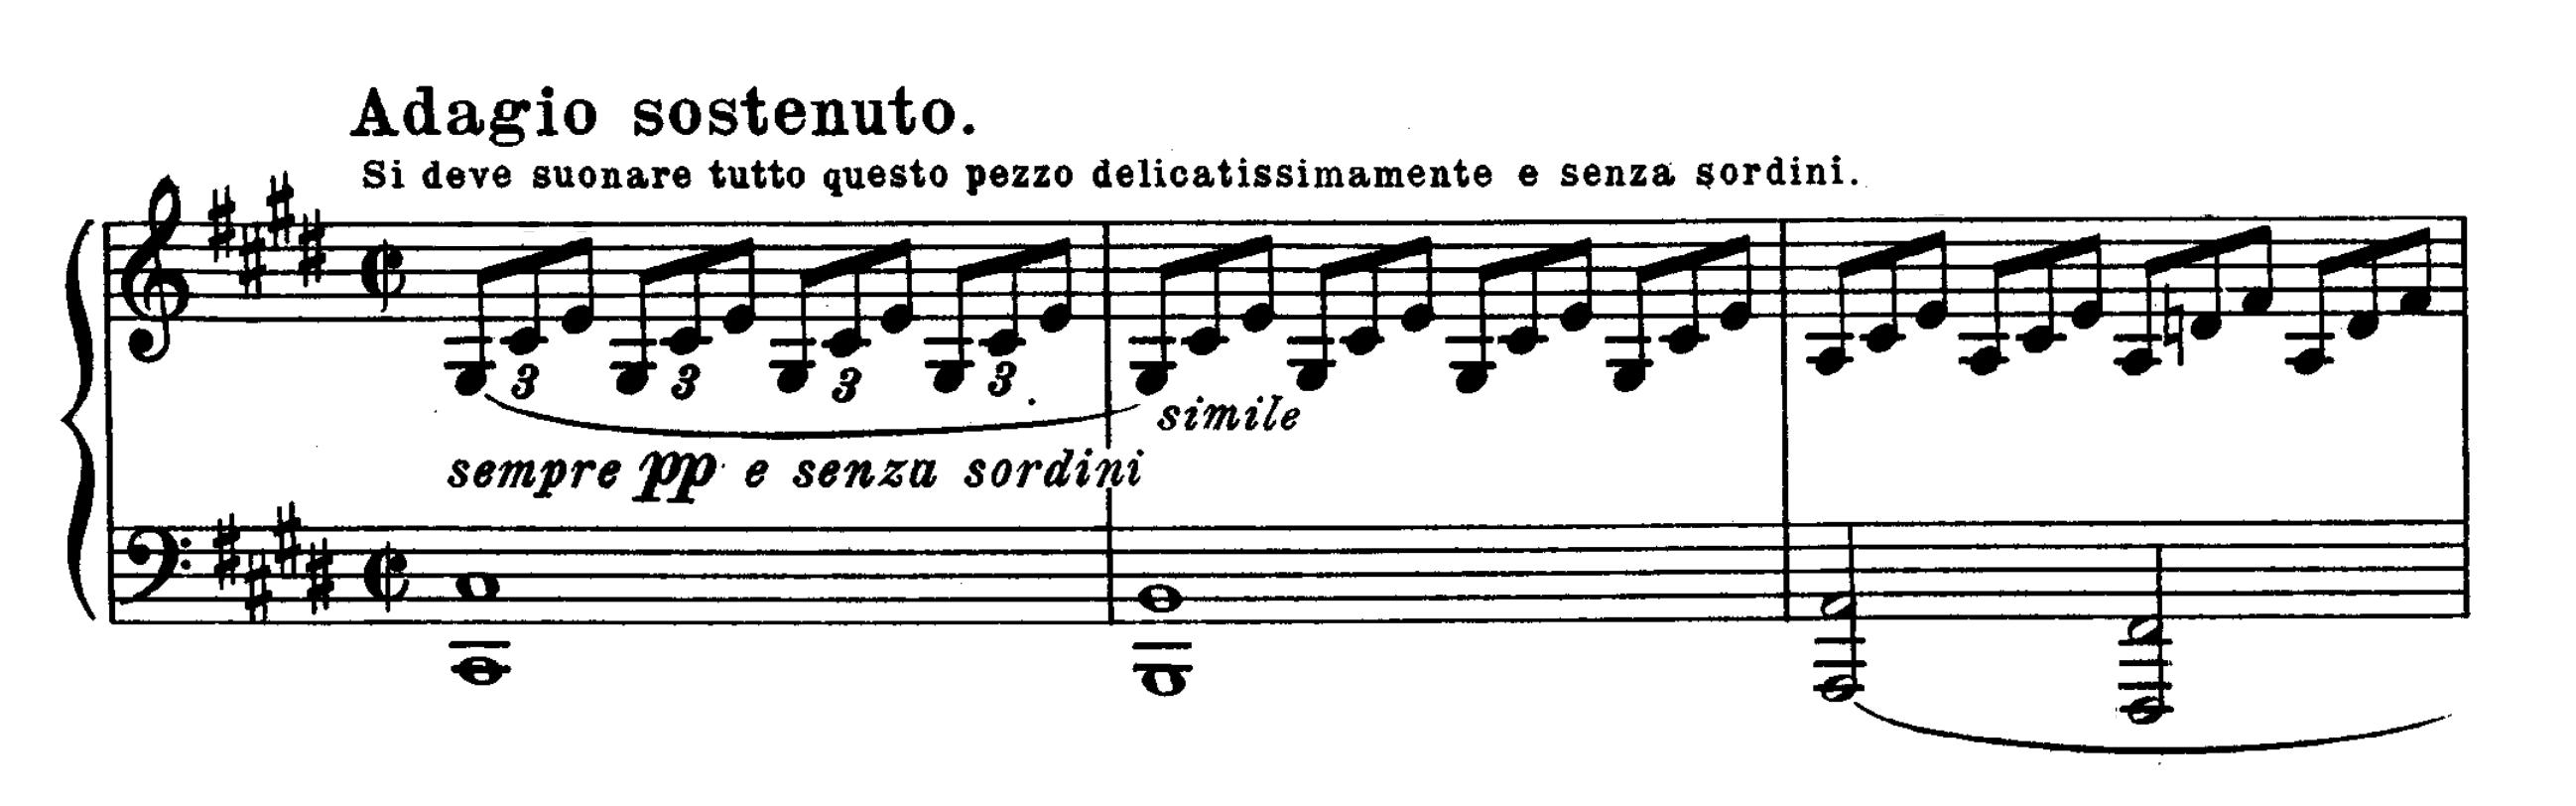 Beethoven: Piano Sonata No 14 in C# Minor